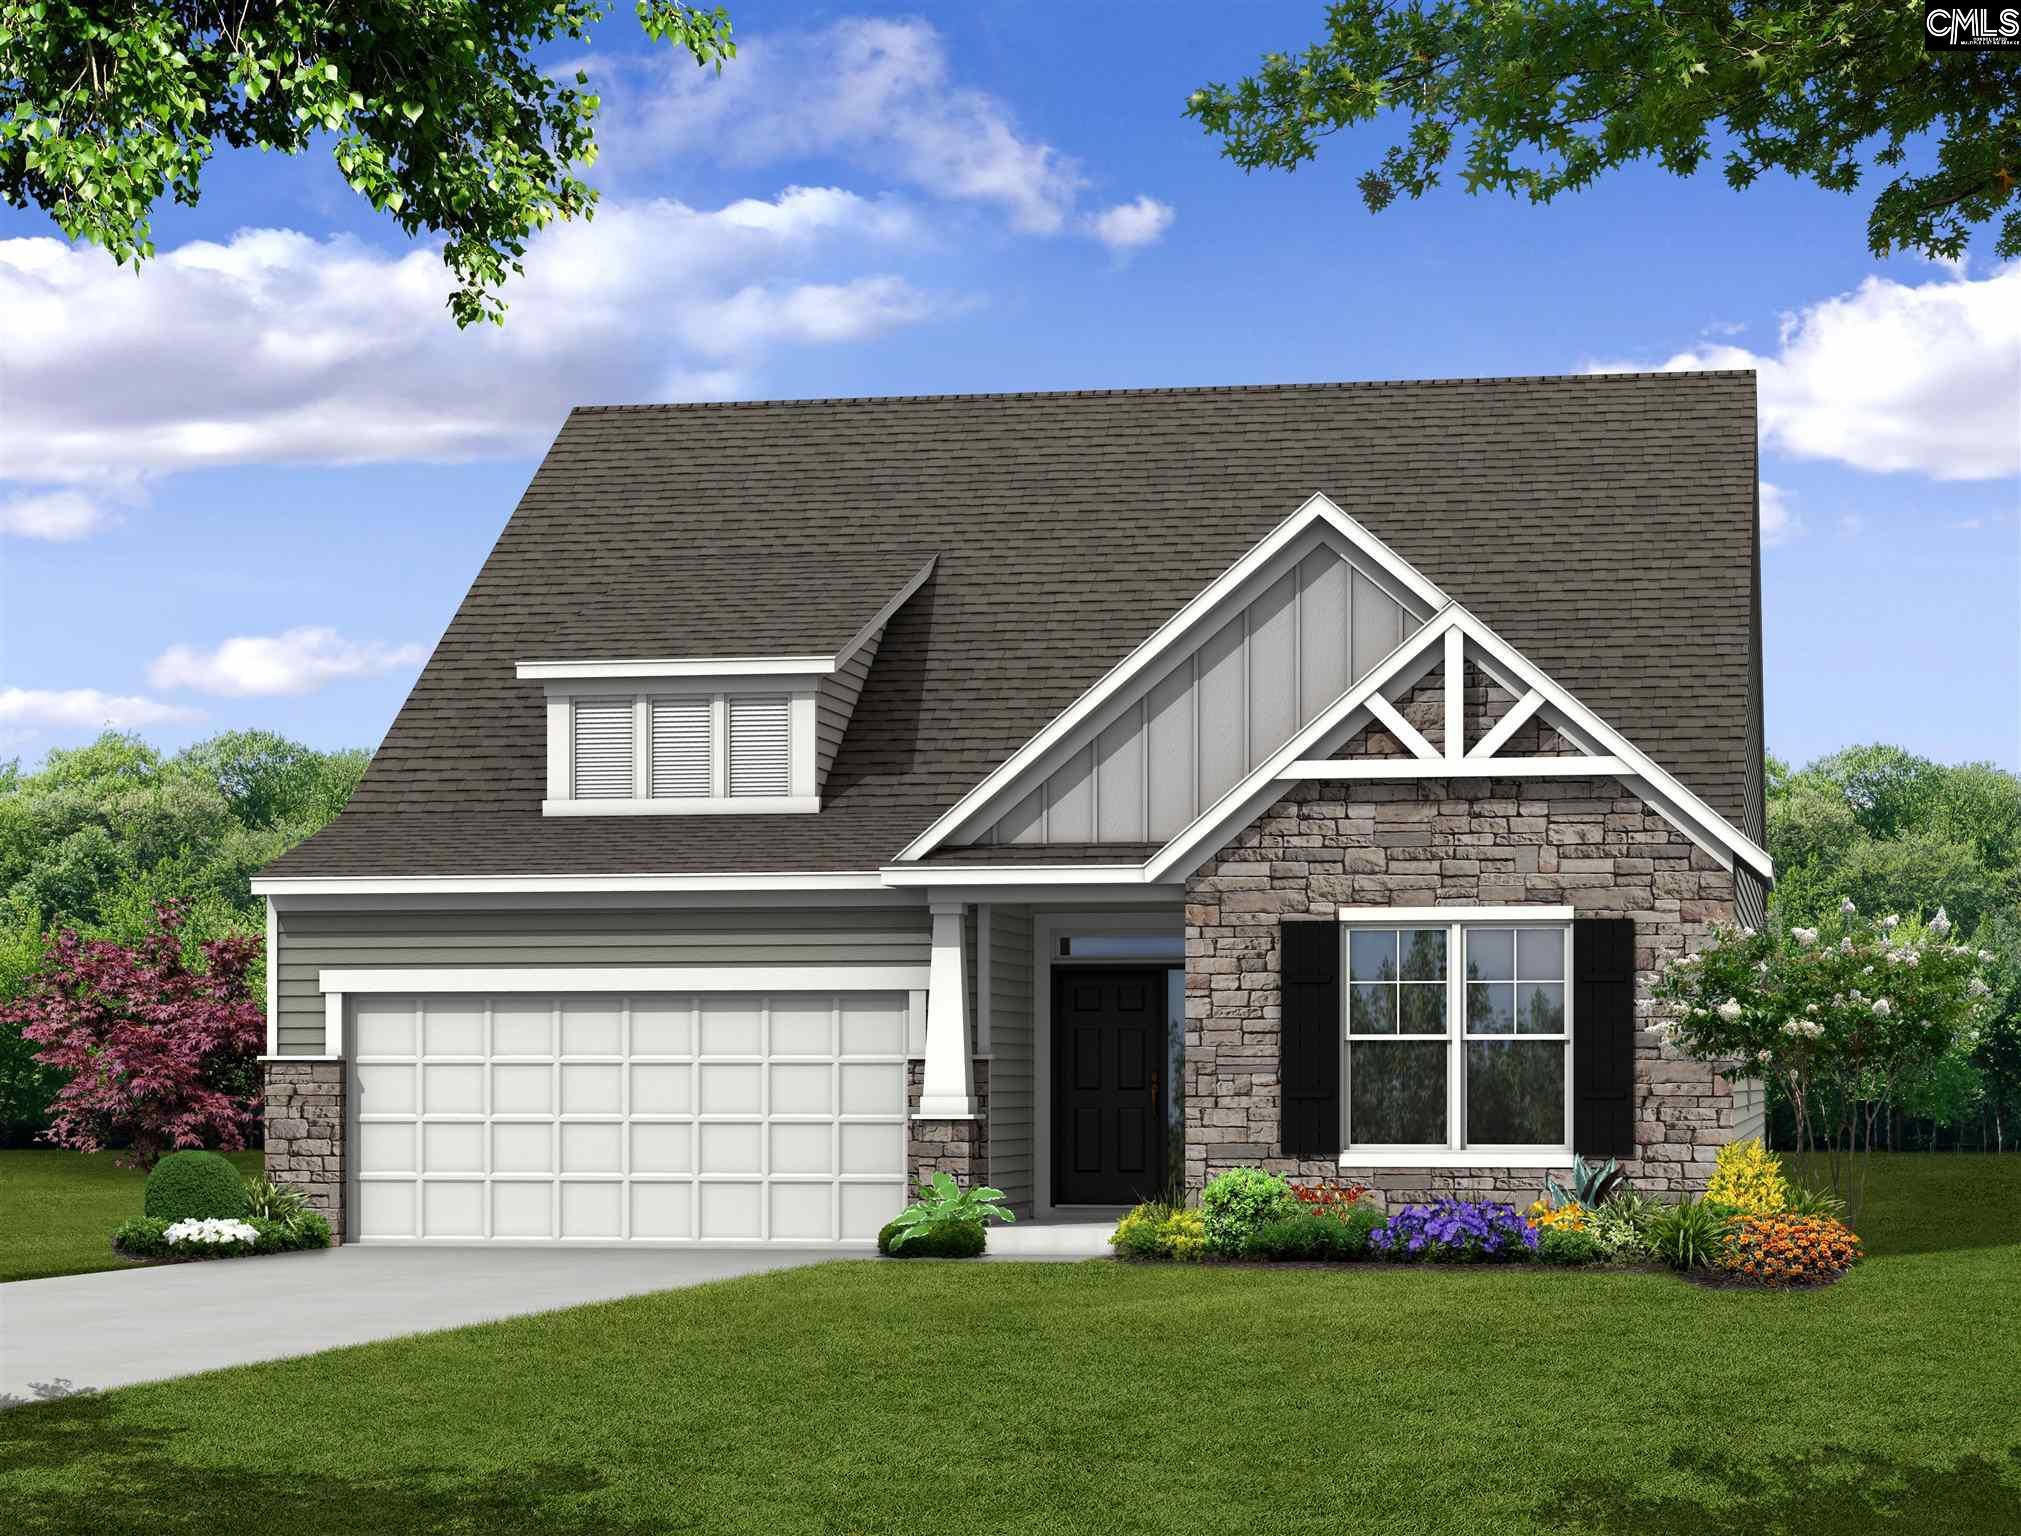 217 Laurelbrook Chapin, SC 29036